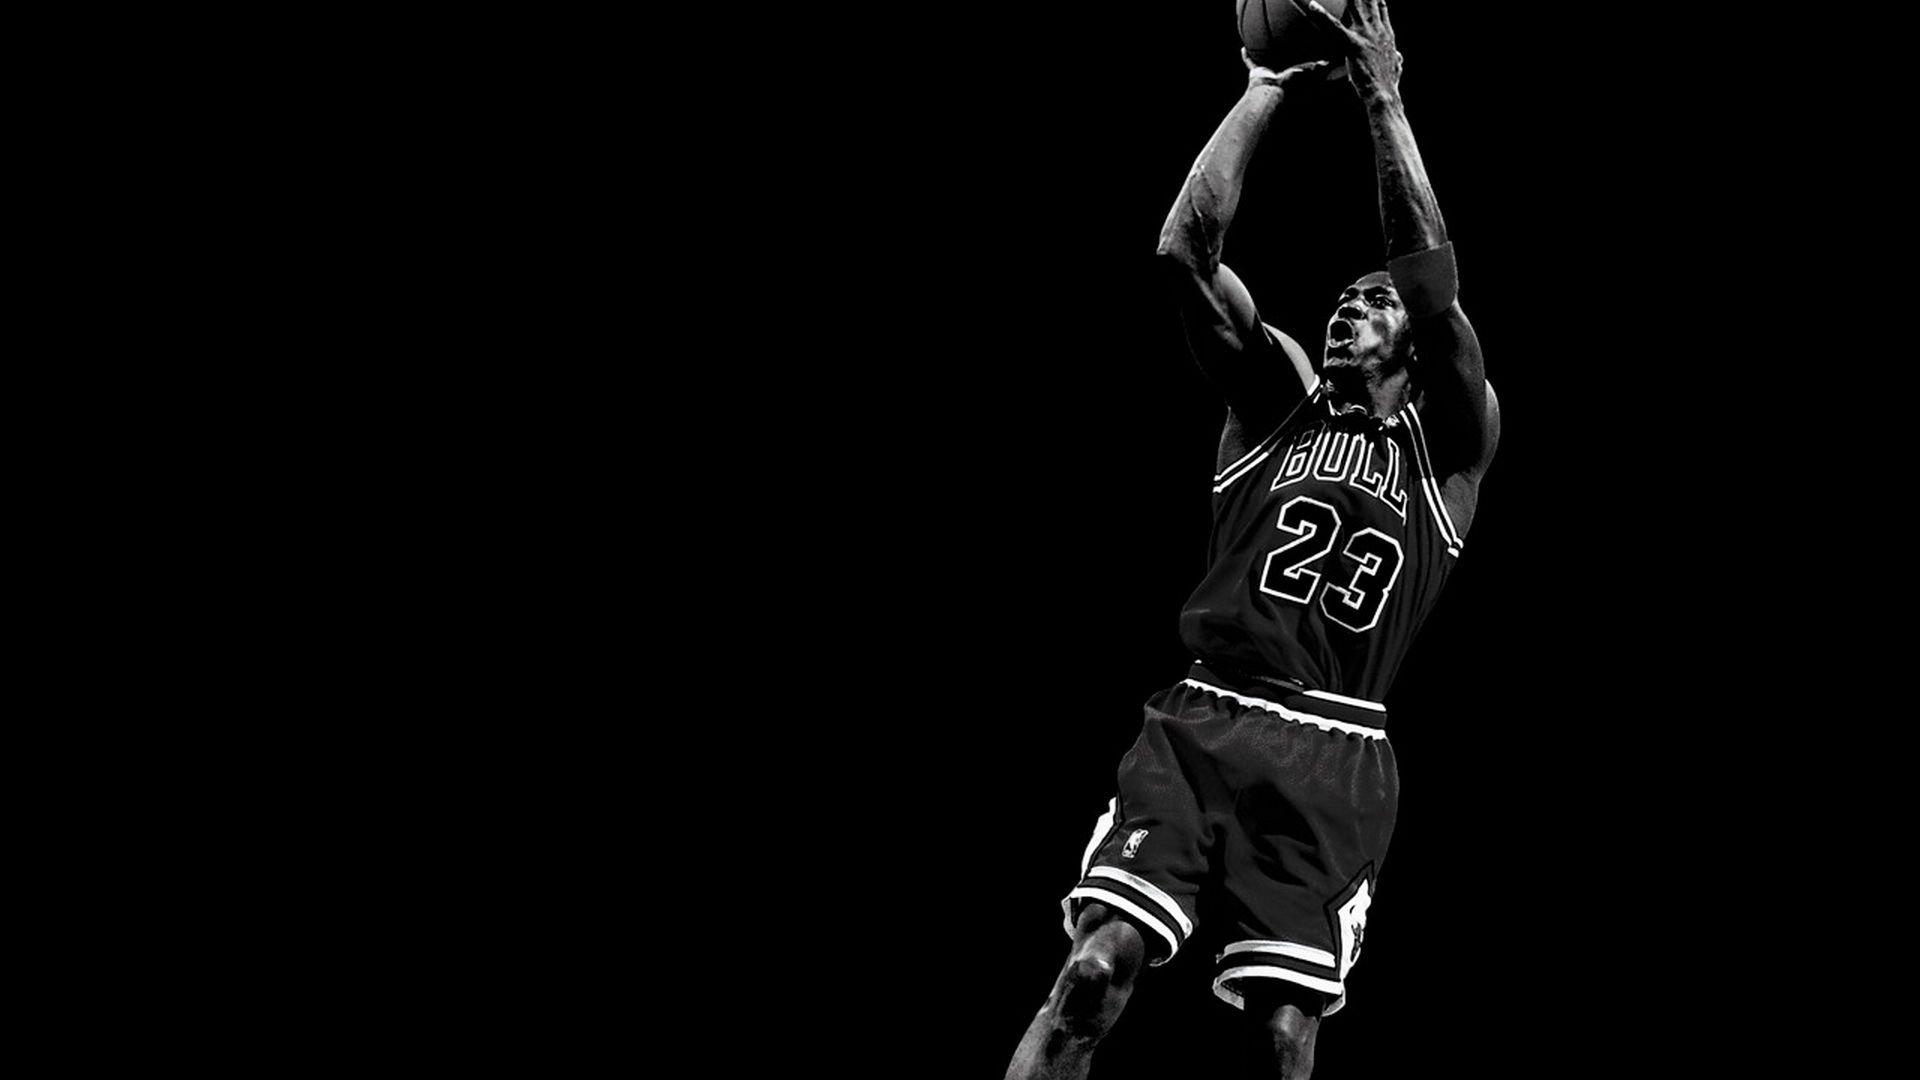 Michael Jordan 1920x1080 Spor